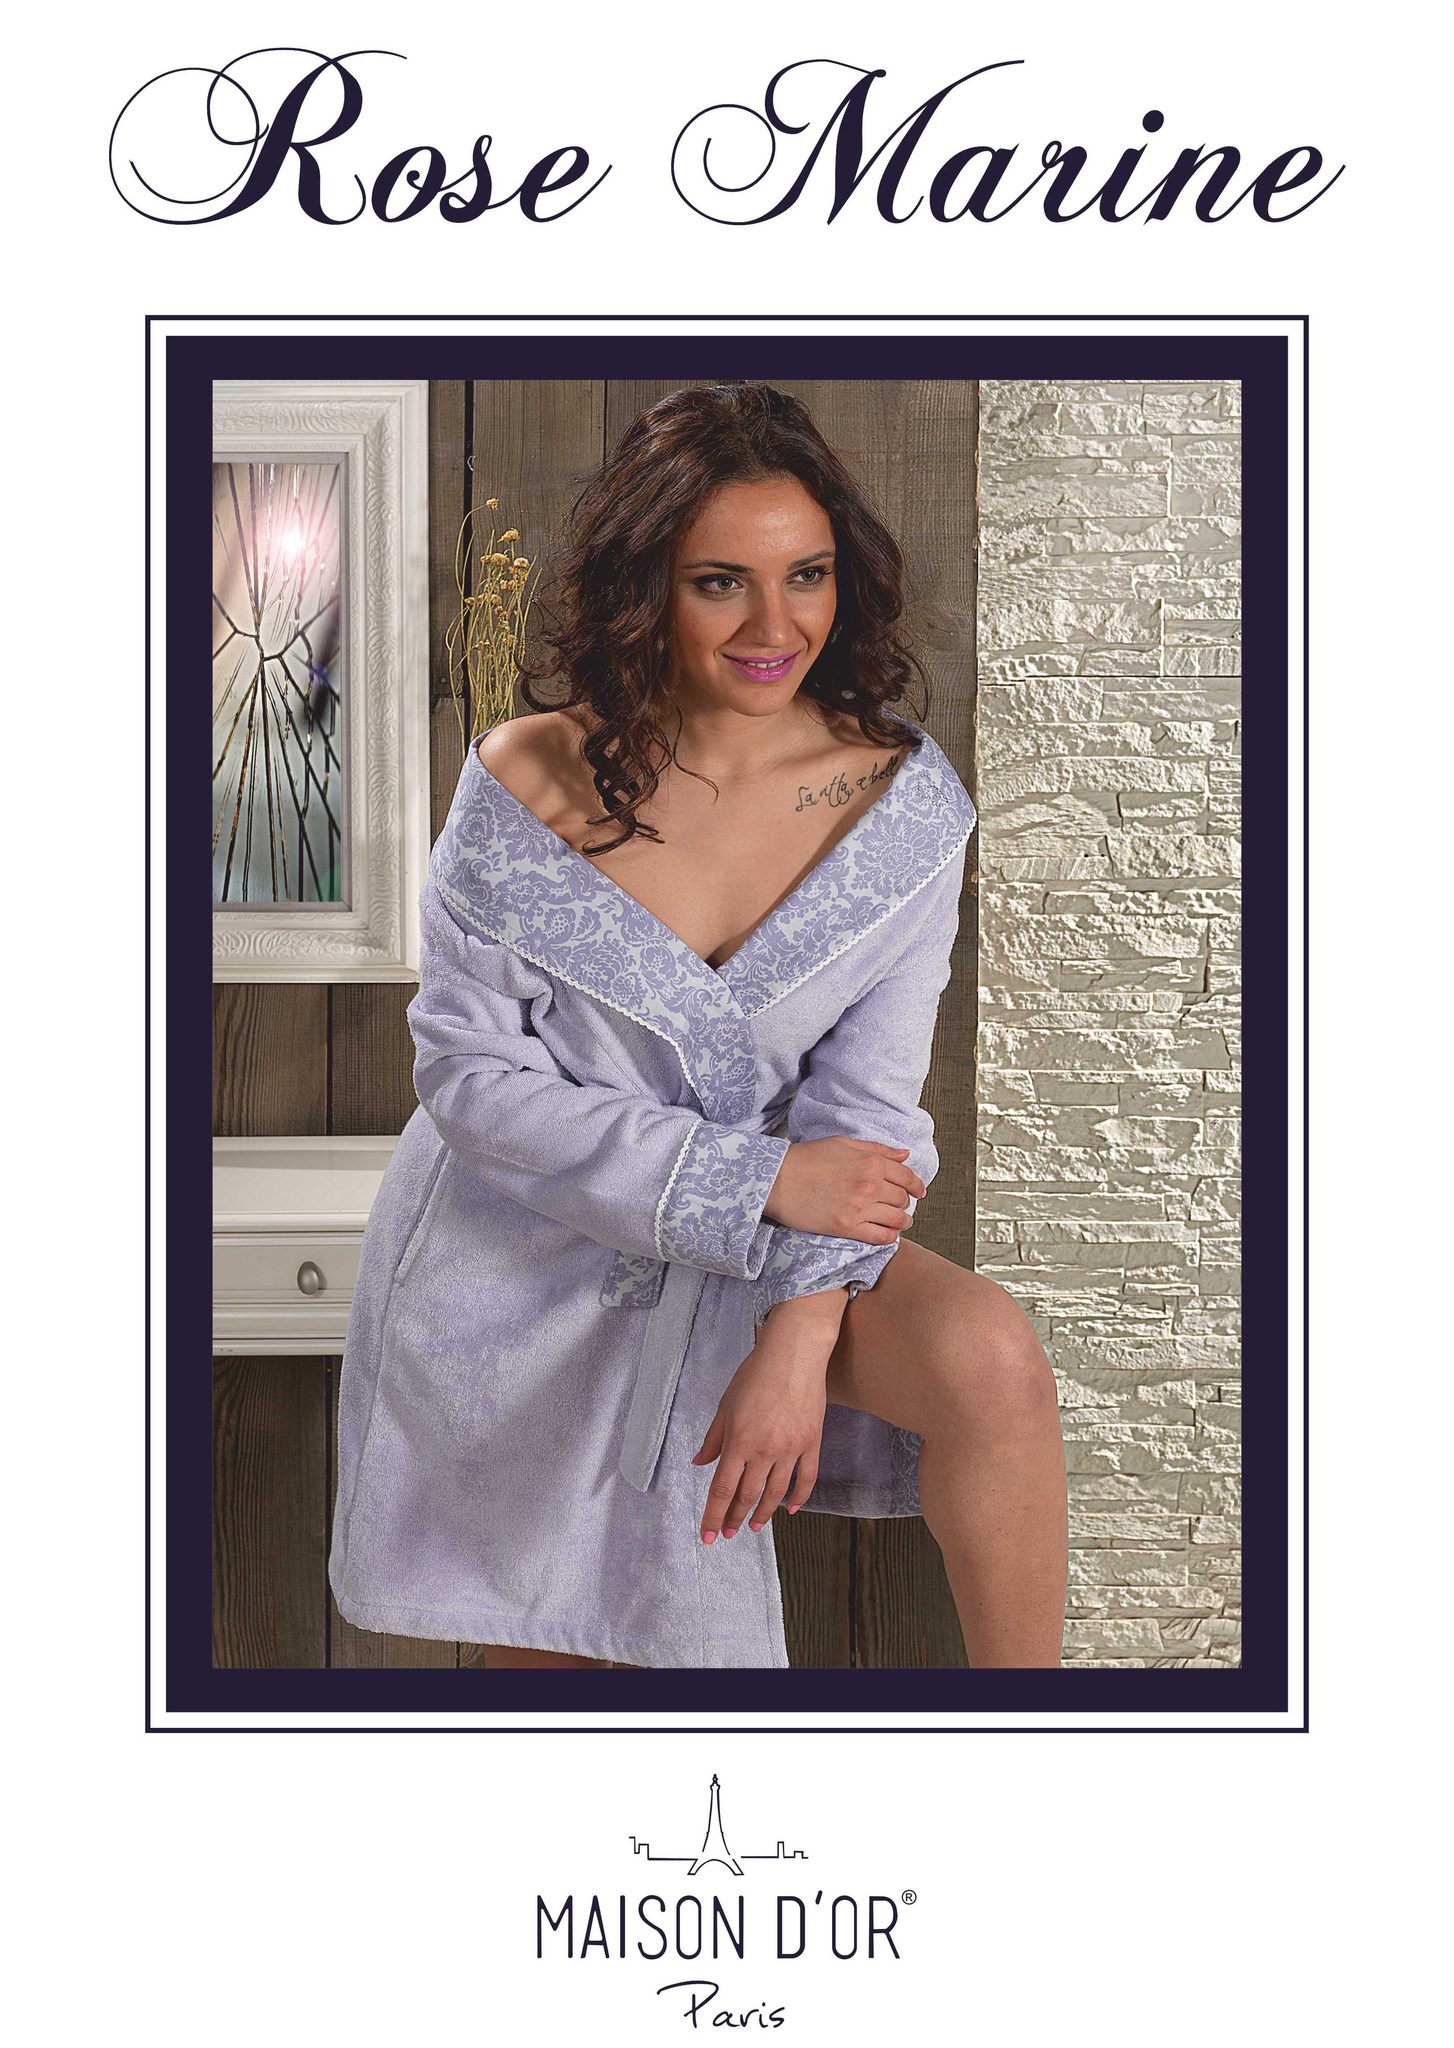 Махровые халаты ROSE MARINE- РОЗ МАРИН  женский бамбуковый халат Maison Dor Rose_Marine-K.jpg